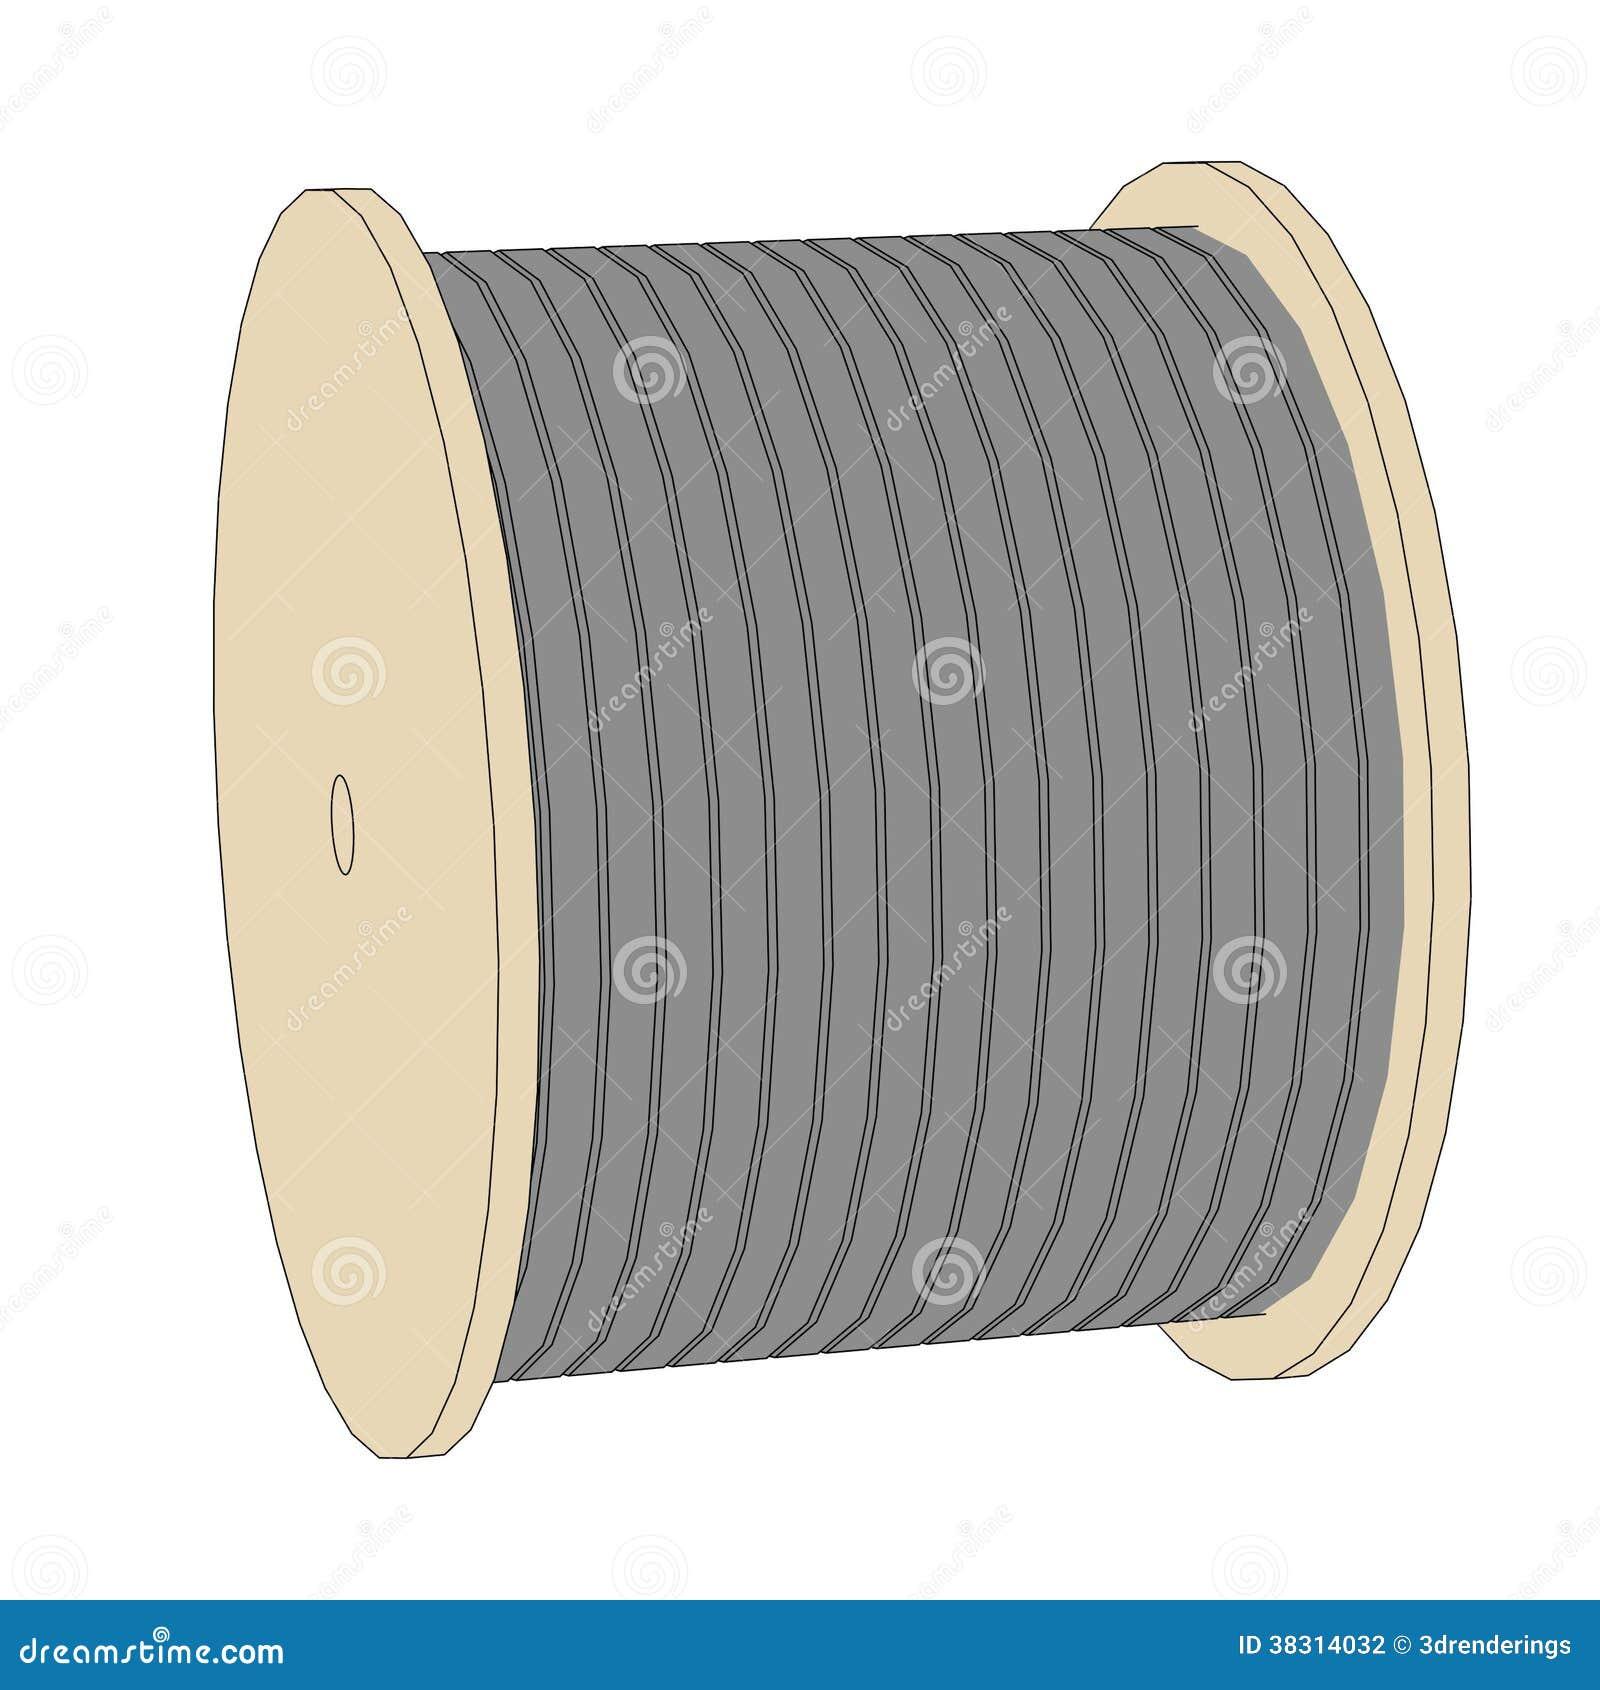 Image of wire spool stock illustration. Illustration of spool - 38314032